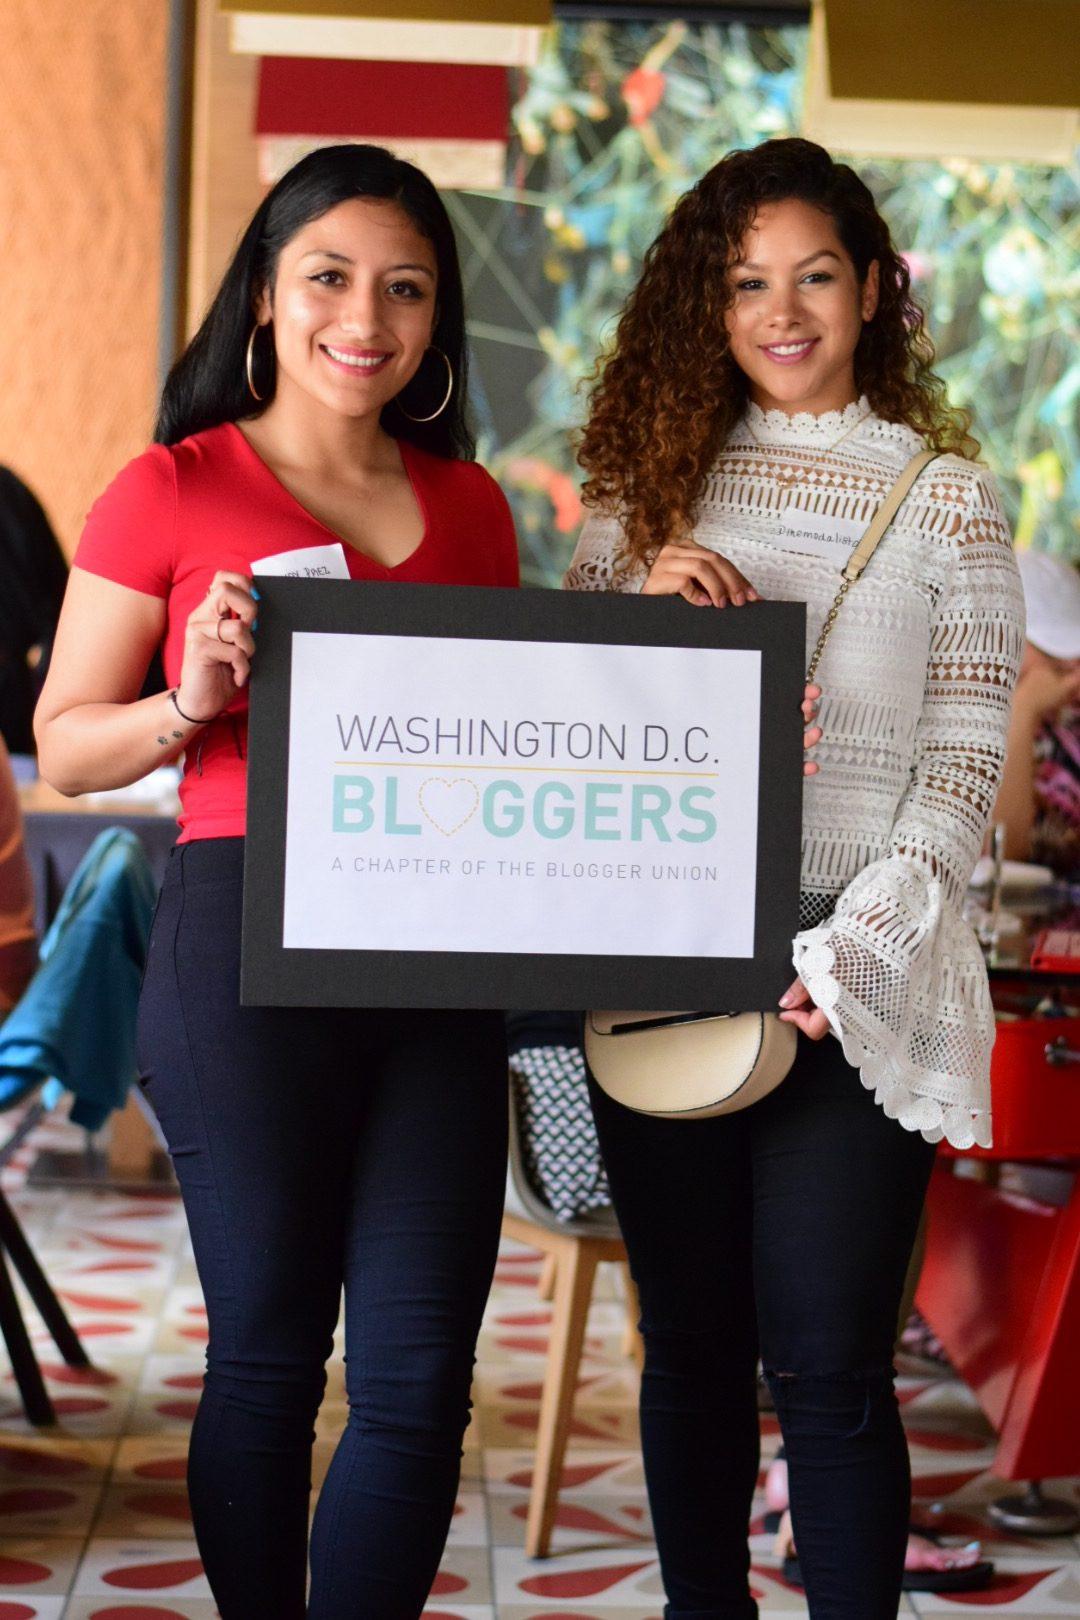 DC Bloggers June Meetup 2017 at Jaleo by Jose D.C